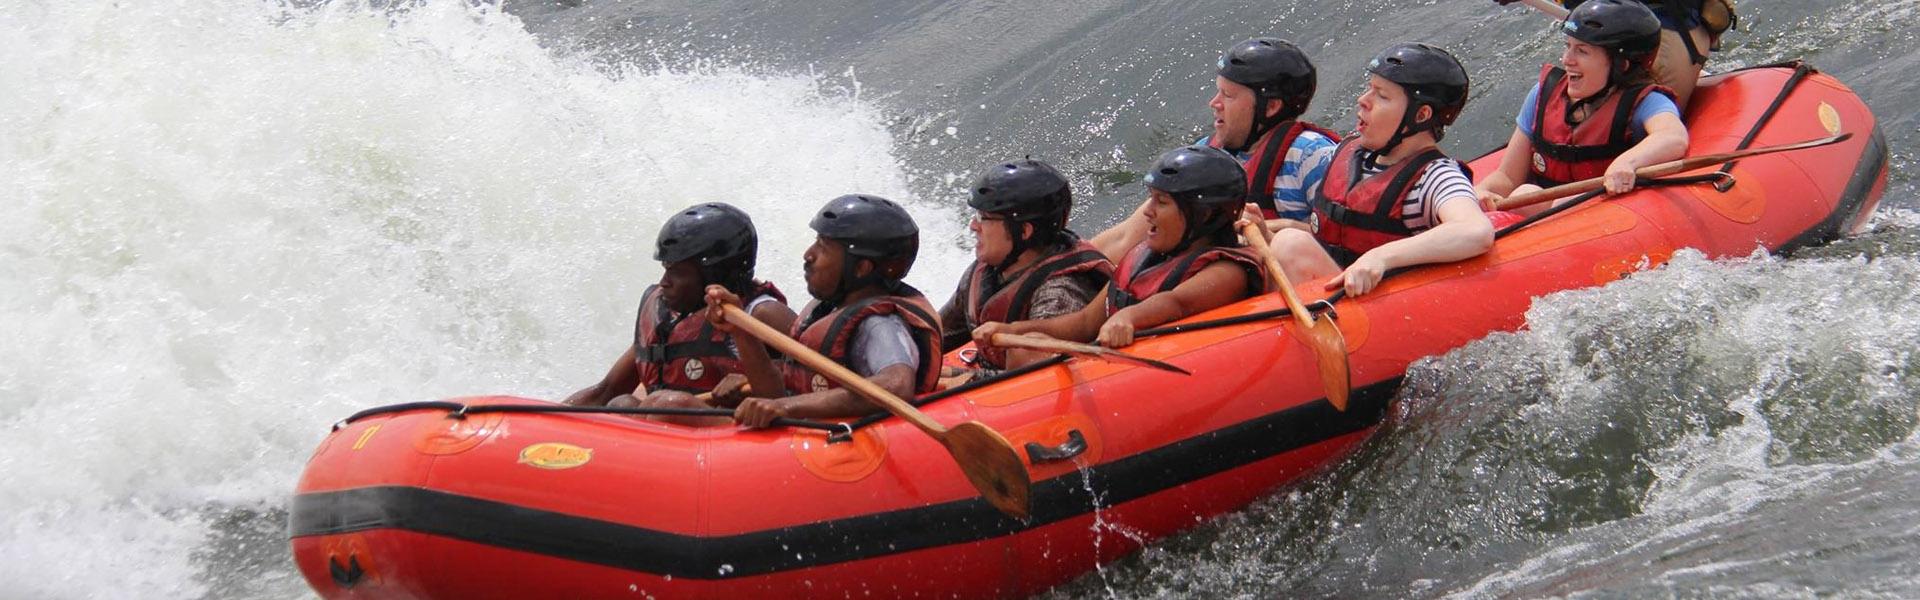 white-water-rafting-jinja-nile-river